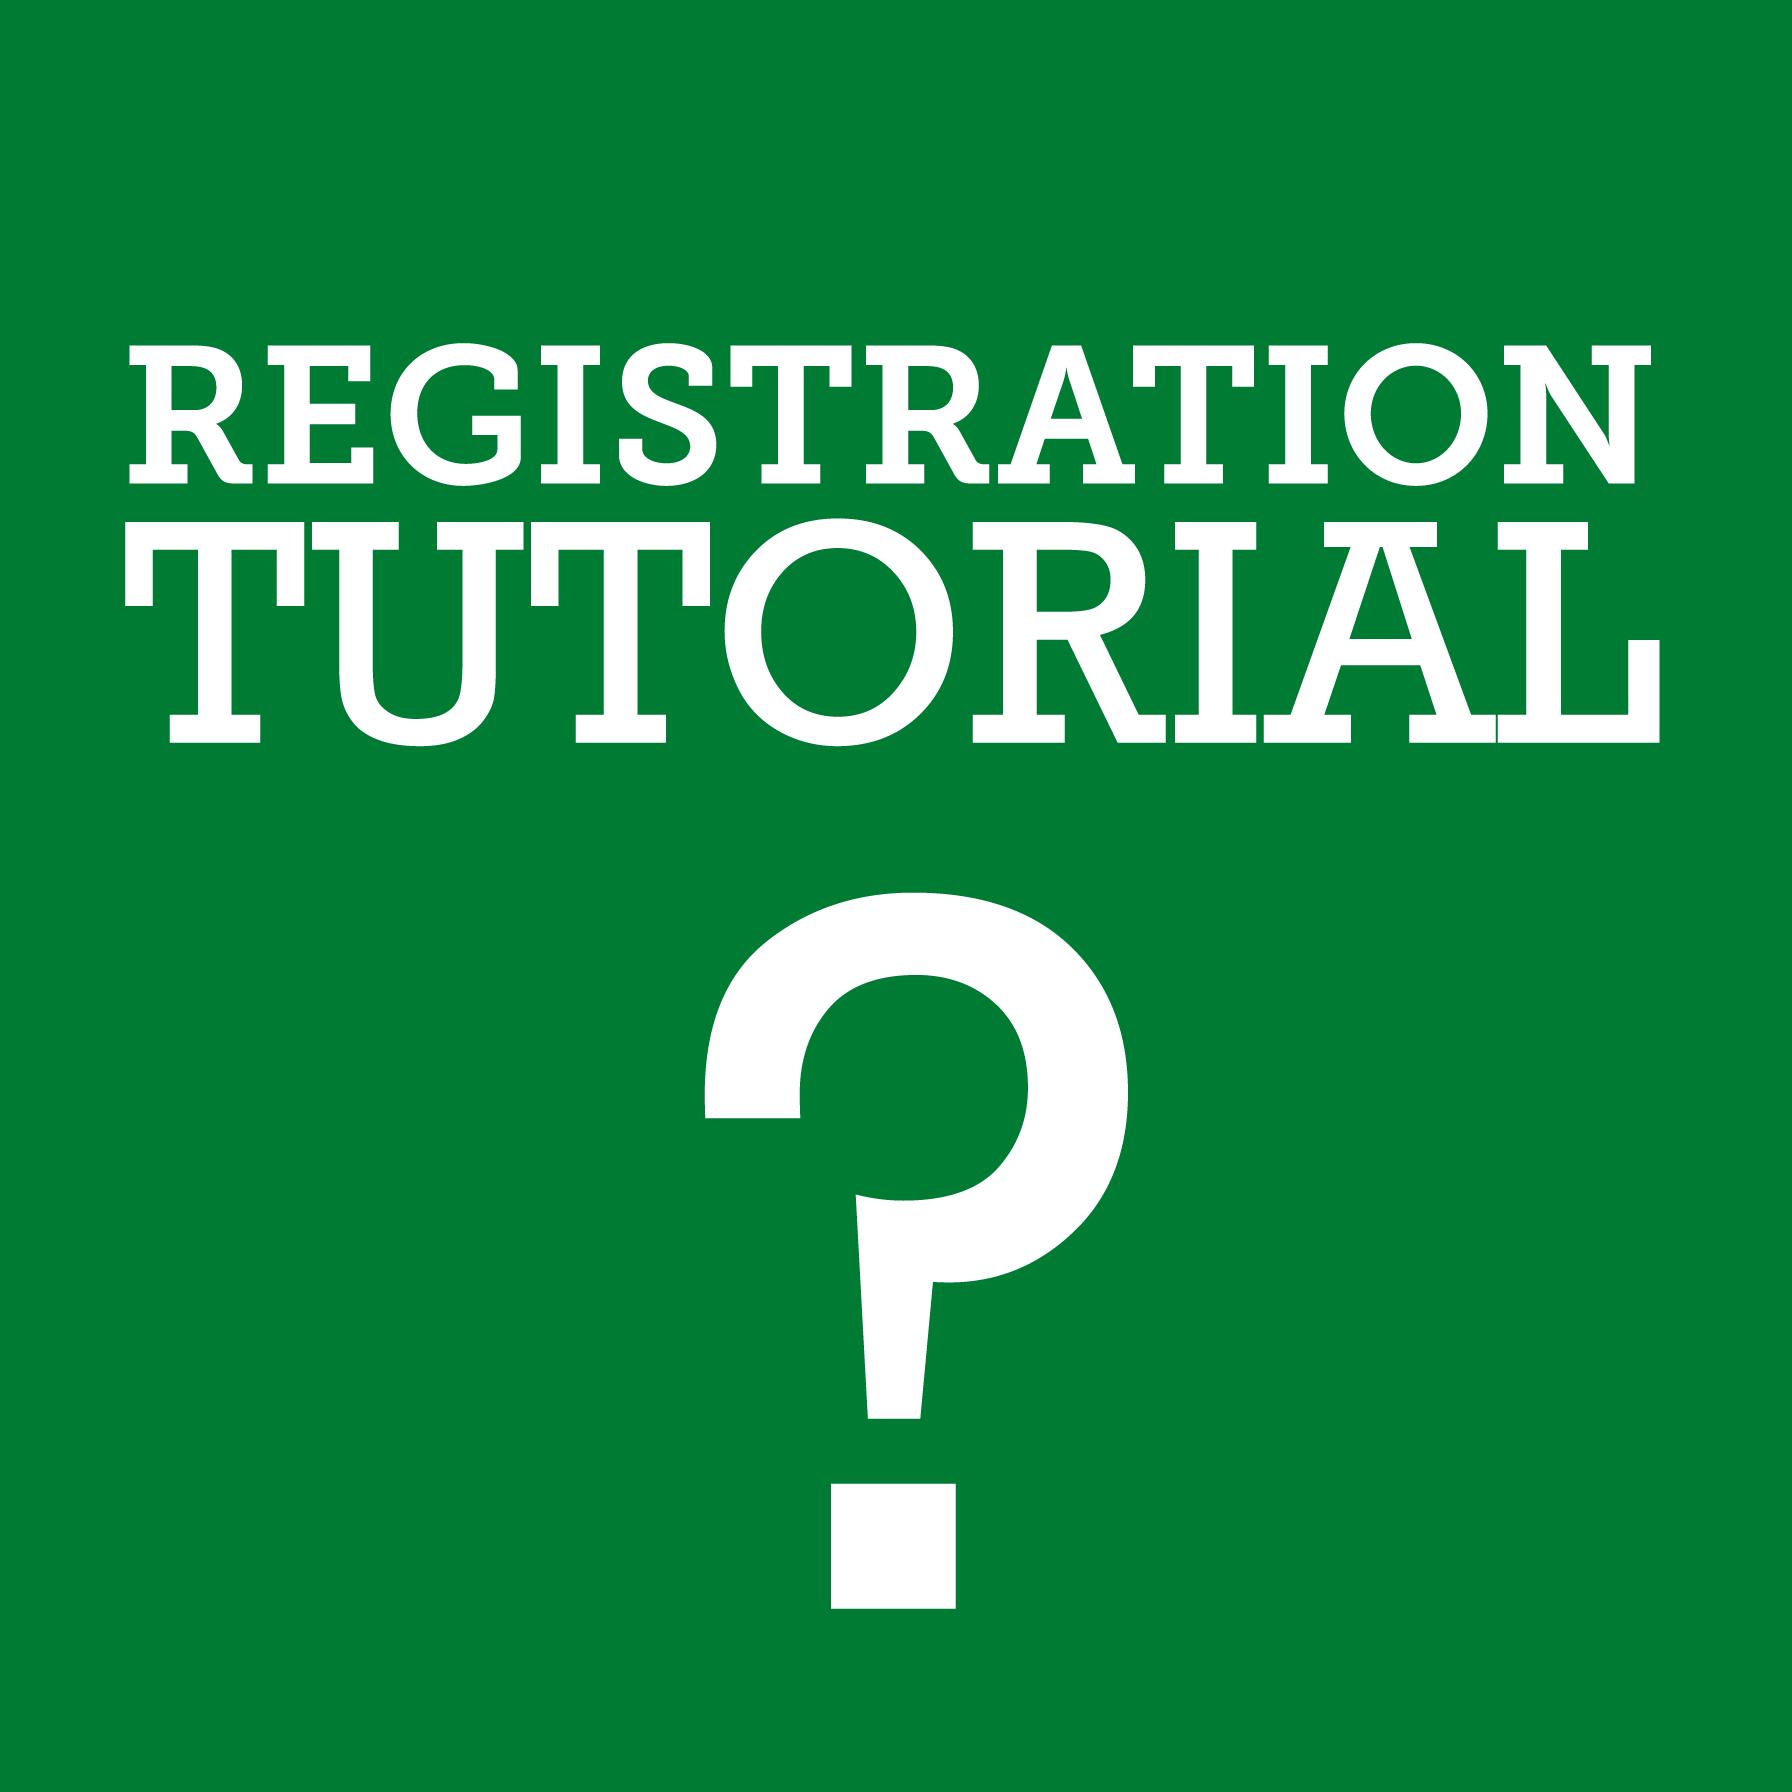 Registration tUTORIAL Logo.png